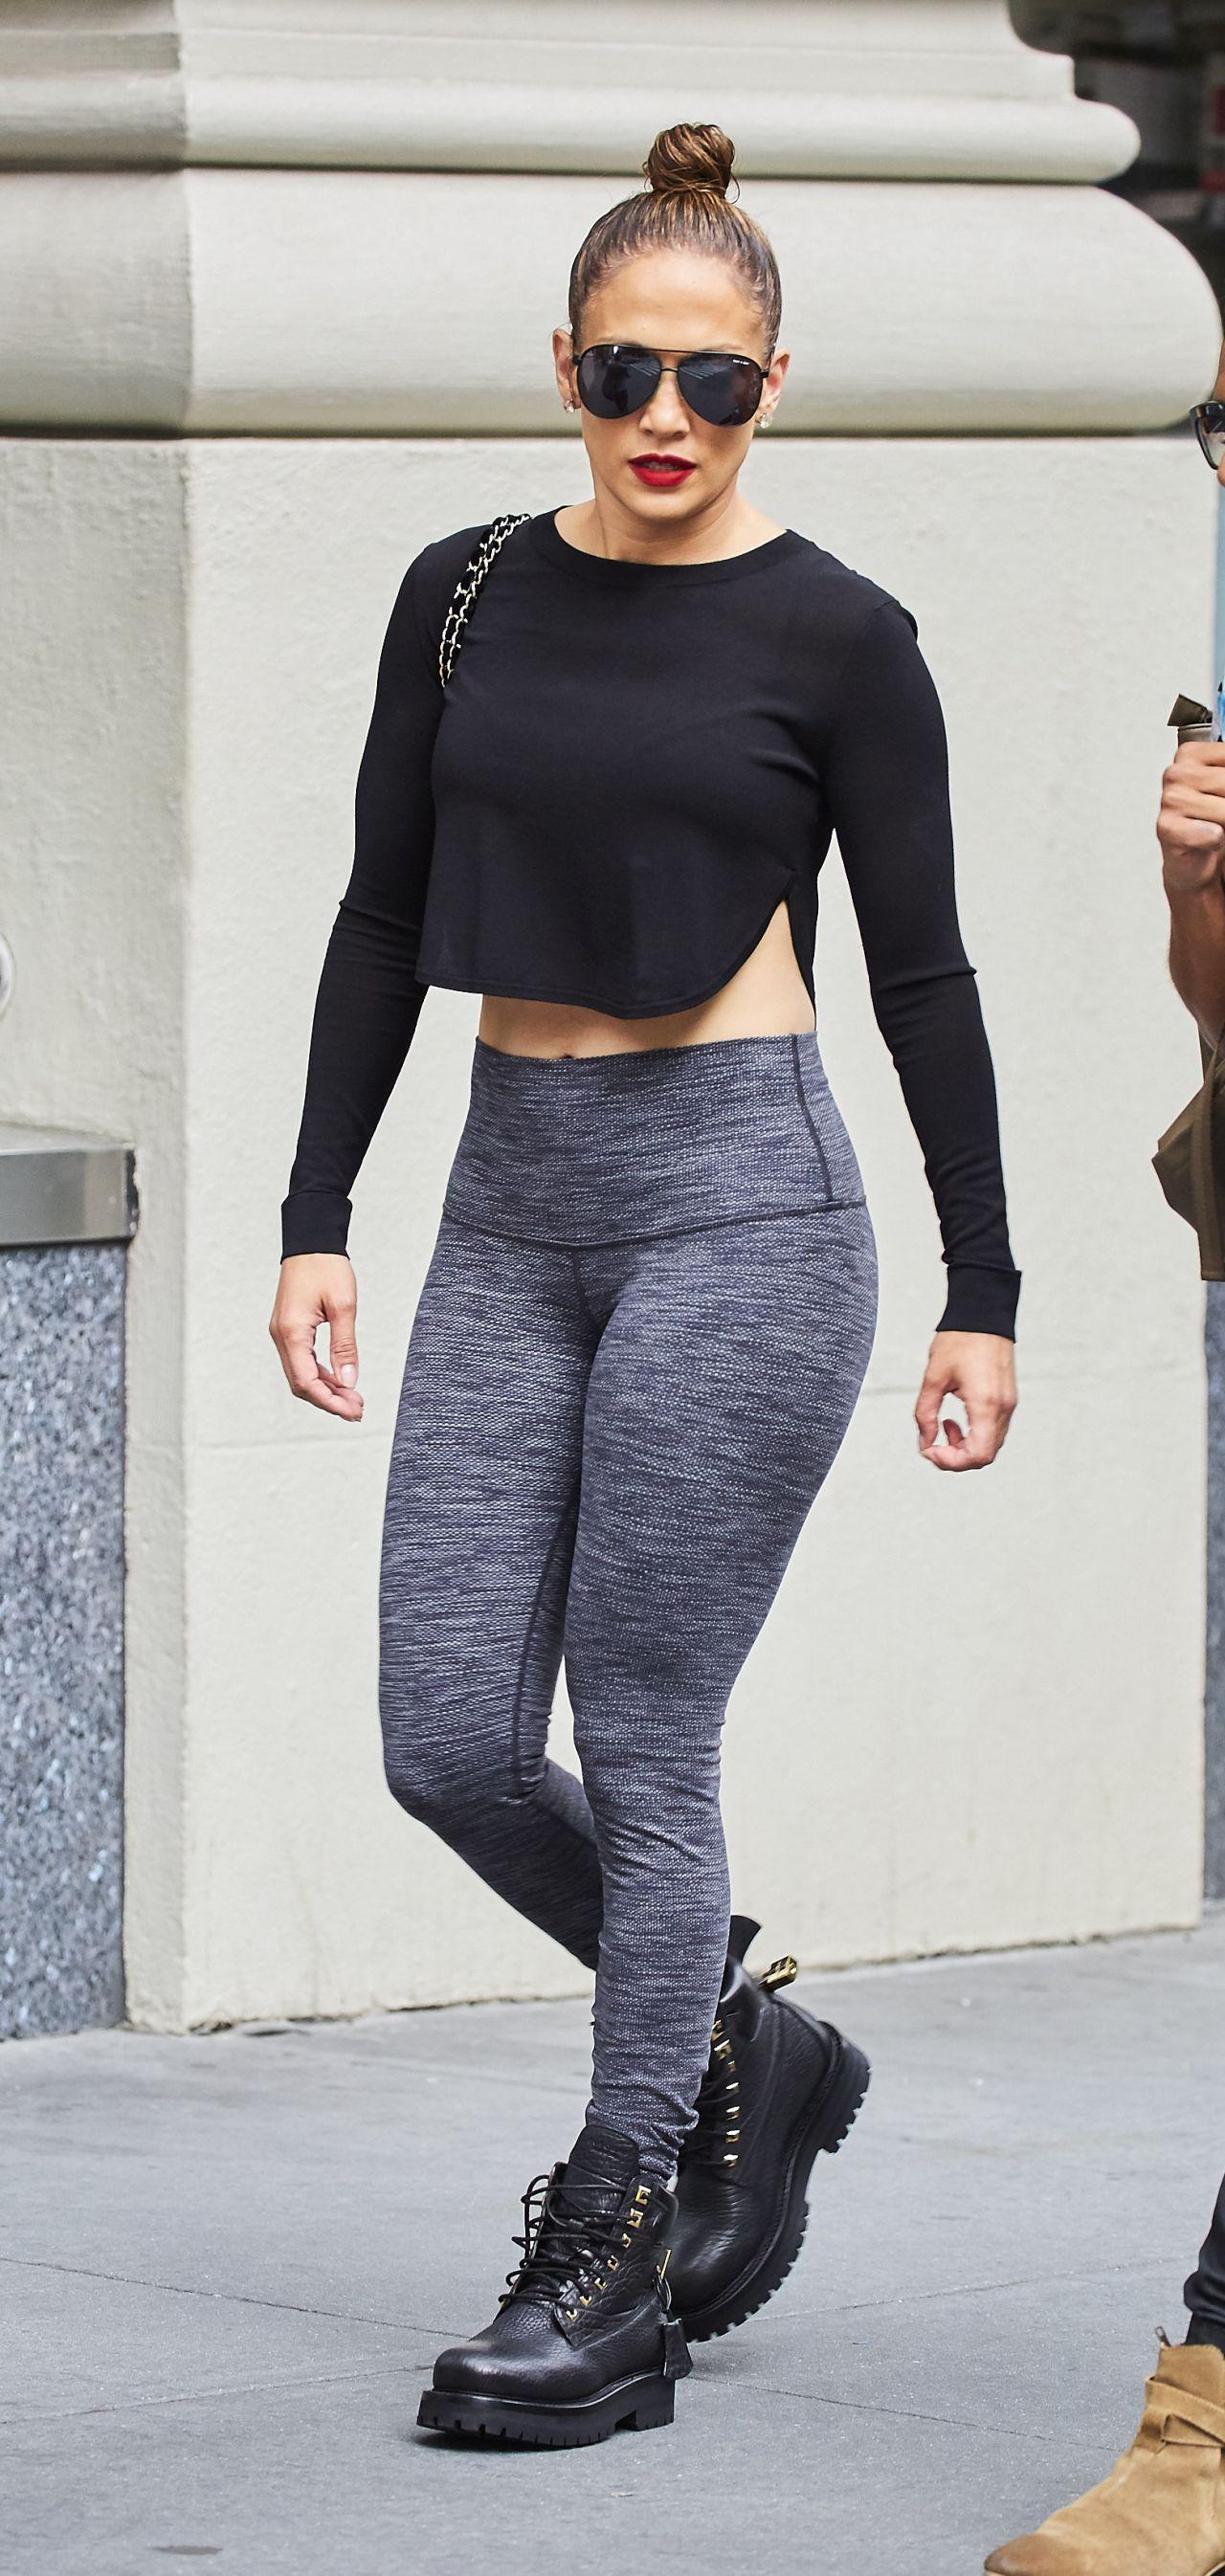 Jennifer Lopez In Tights New York City 07 10 2016